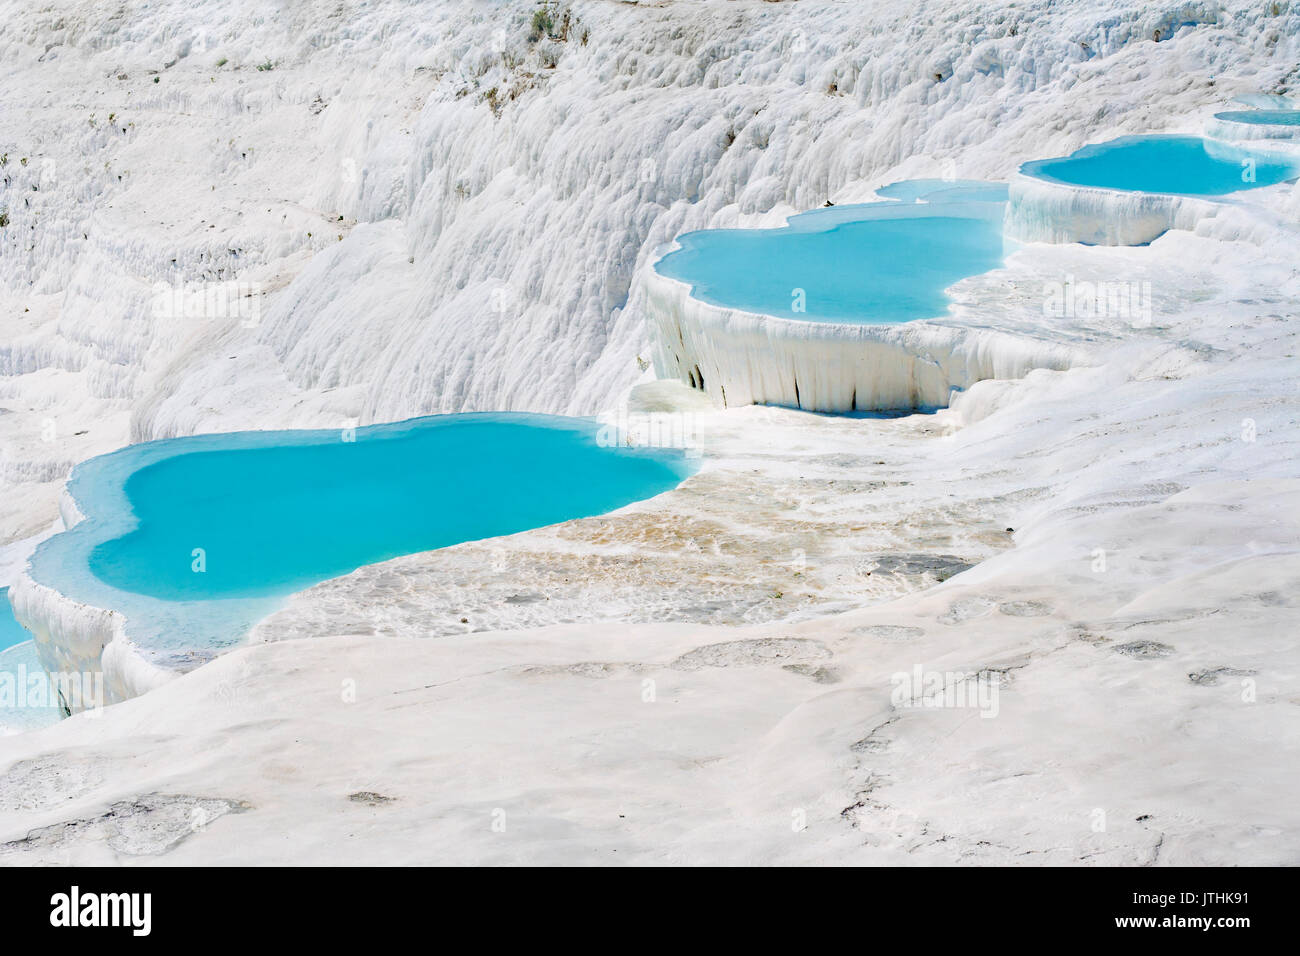 Travertino natural piscinas y terrazas, Pamukkale, Turquía Imagen De Stock